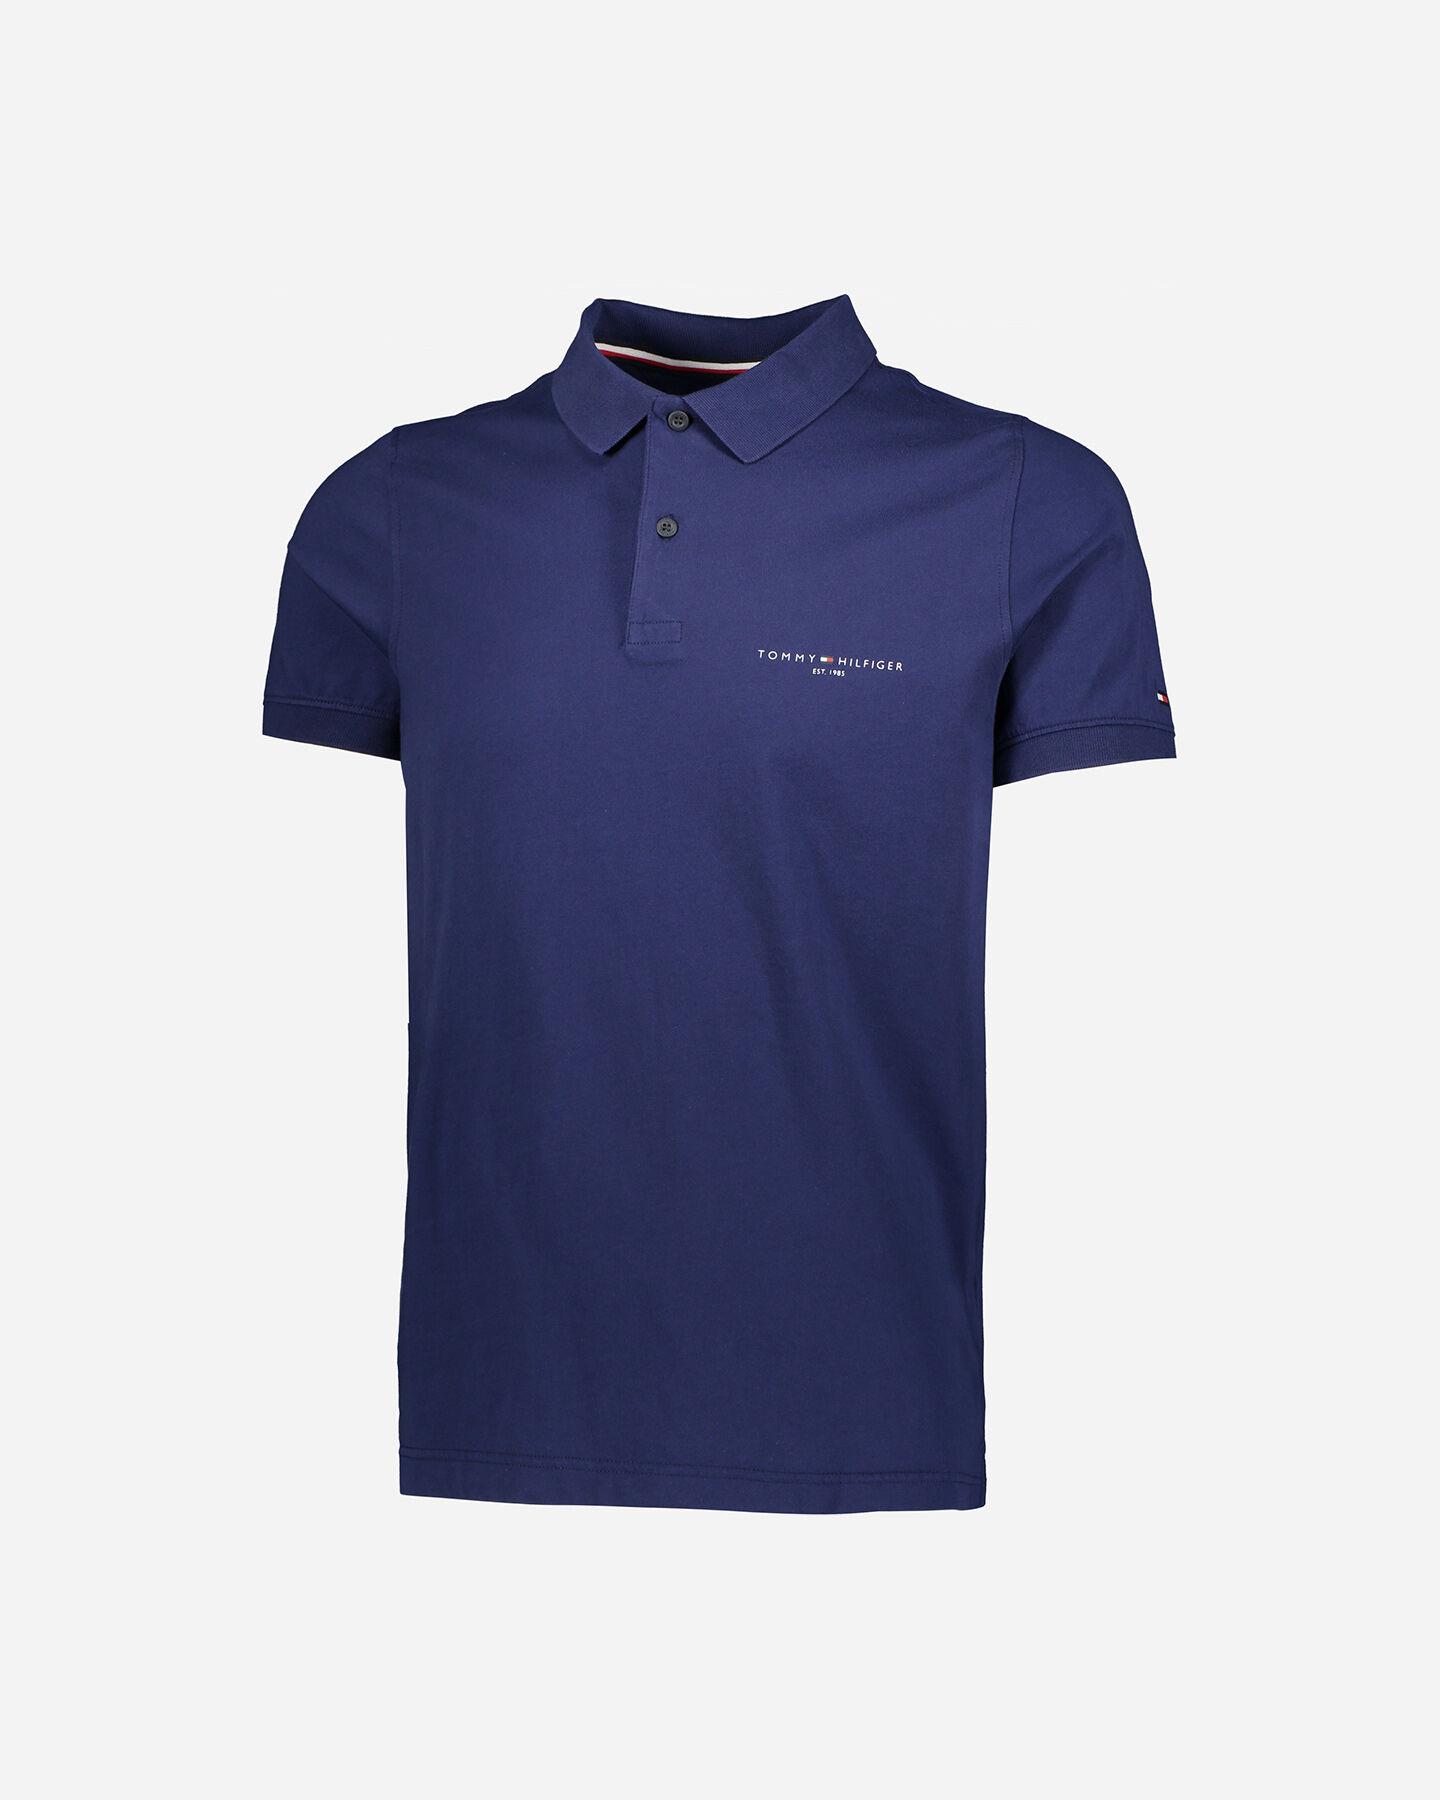 T-Shirt TOMMY HILFIGER CLEAN SLIM M S4089536 scatto 5